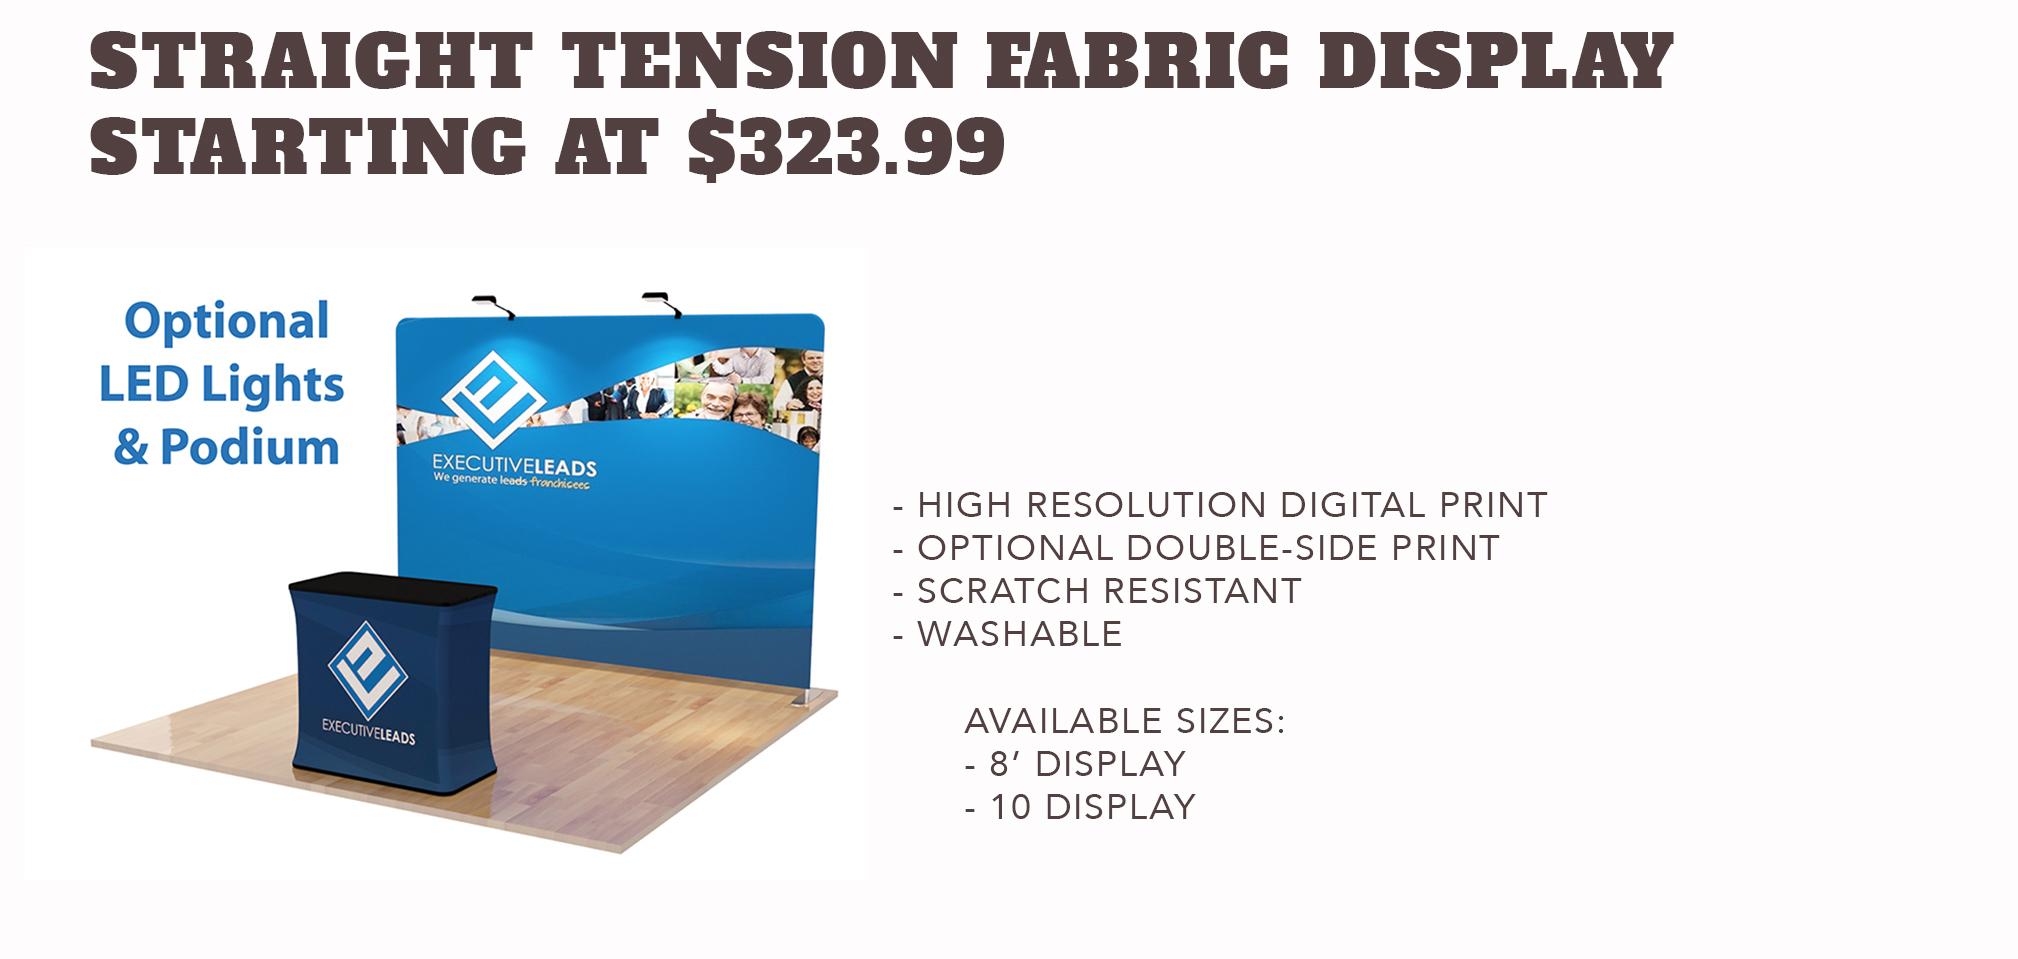 Straight TensionFabric Displays - Starting at $323.99